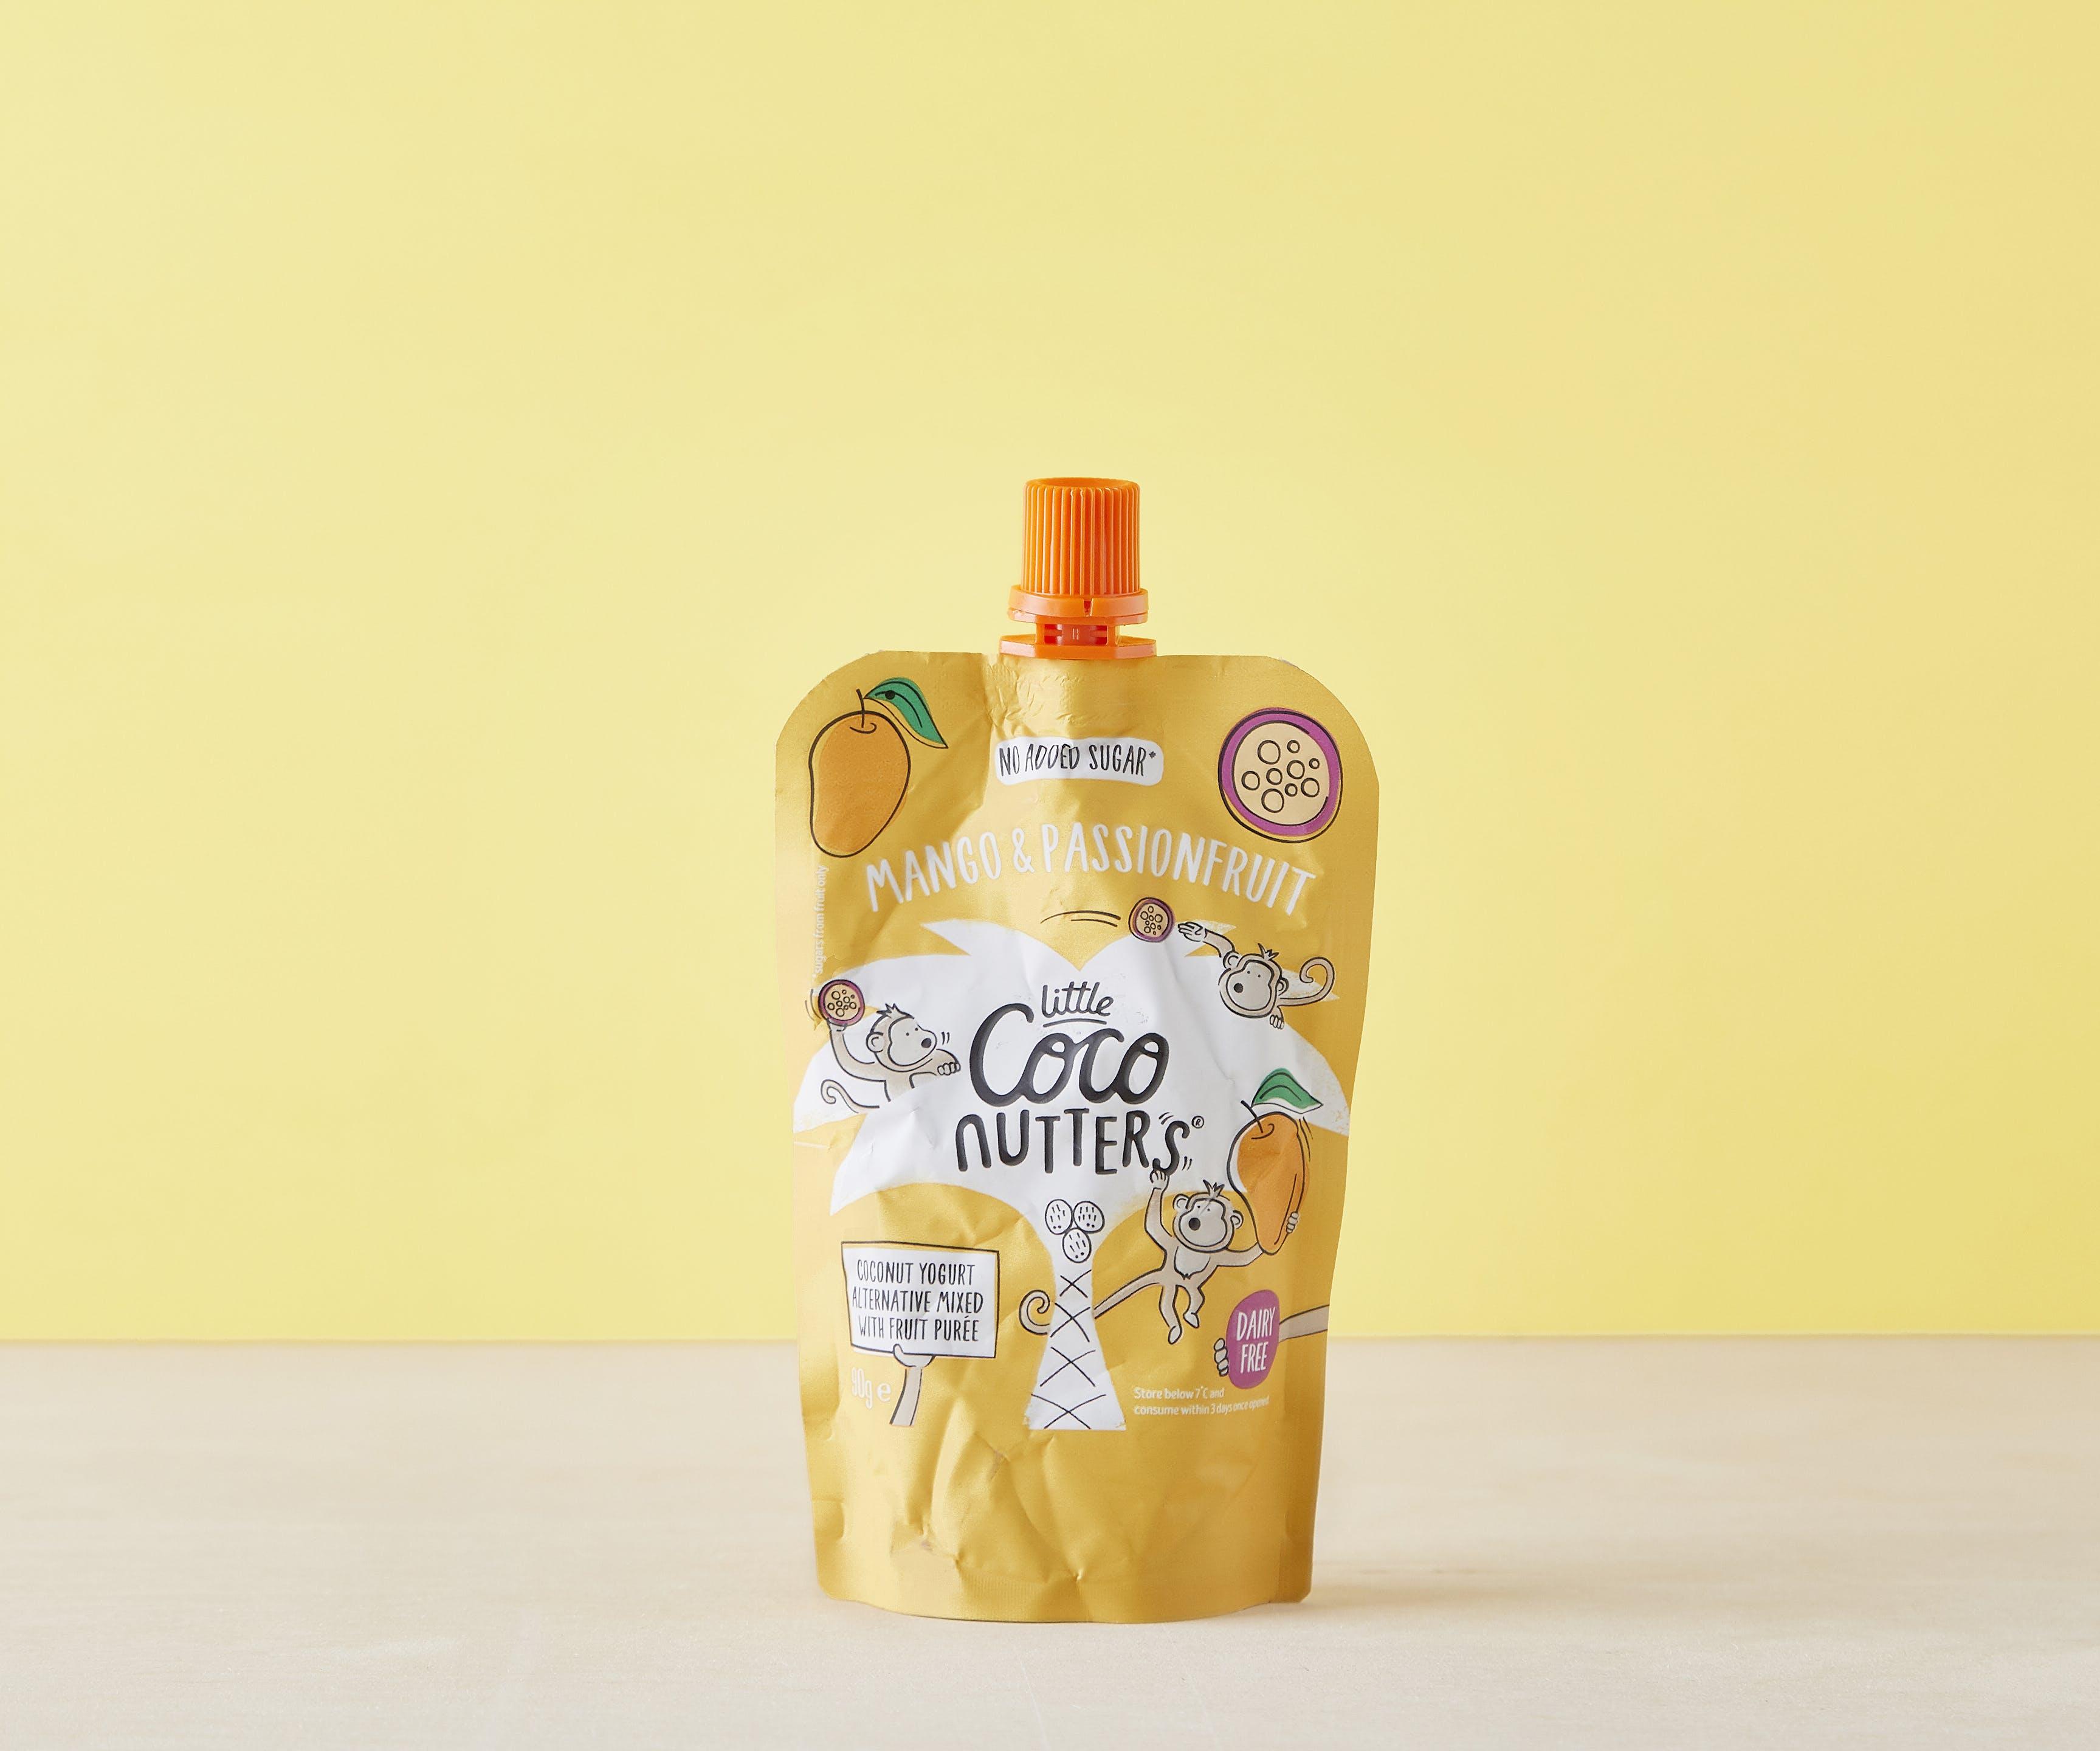 Little Coco Nutters Pouch - Mango & Passion Fruit